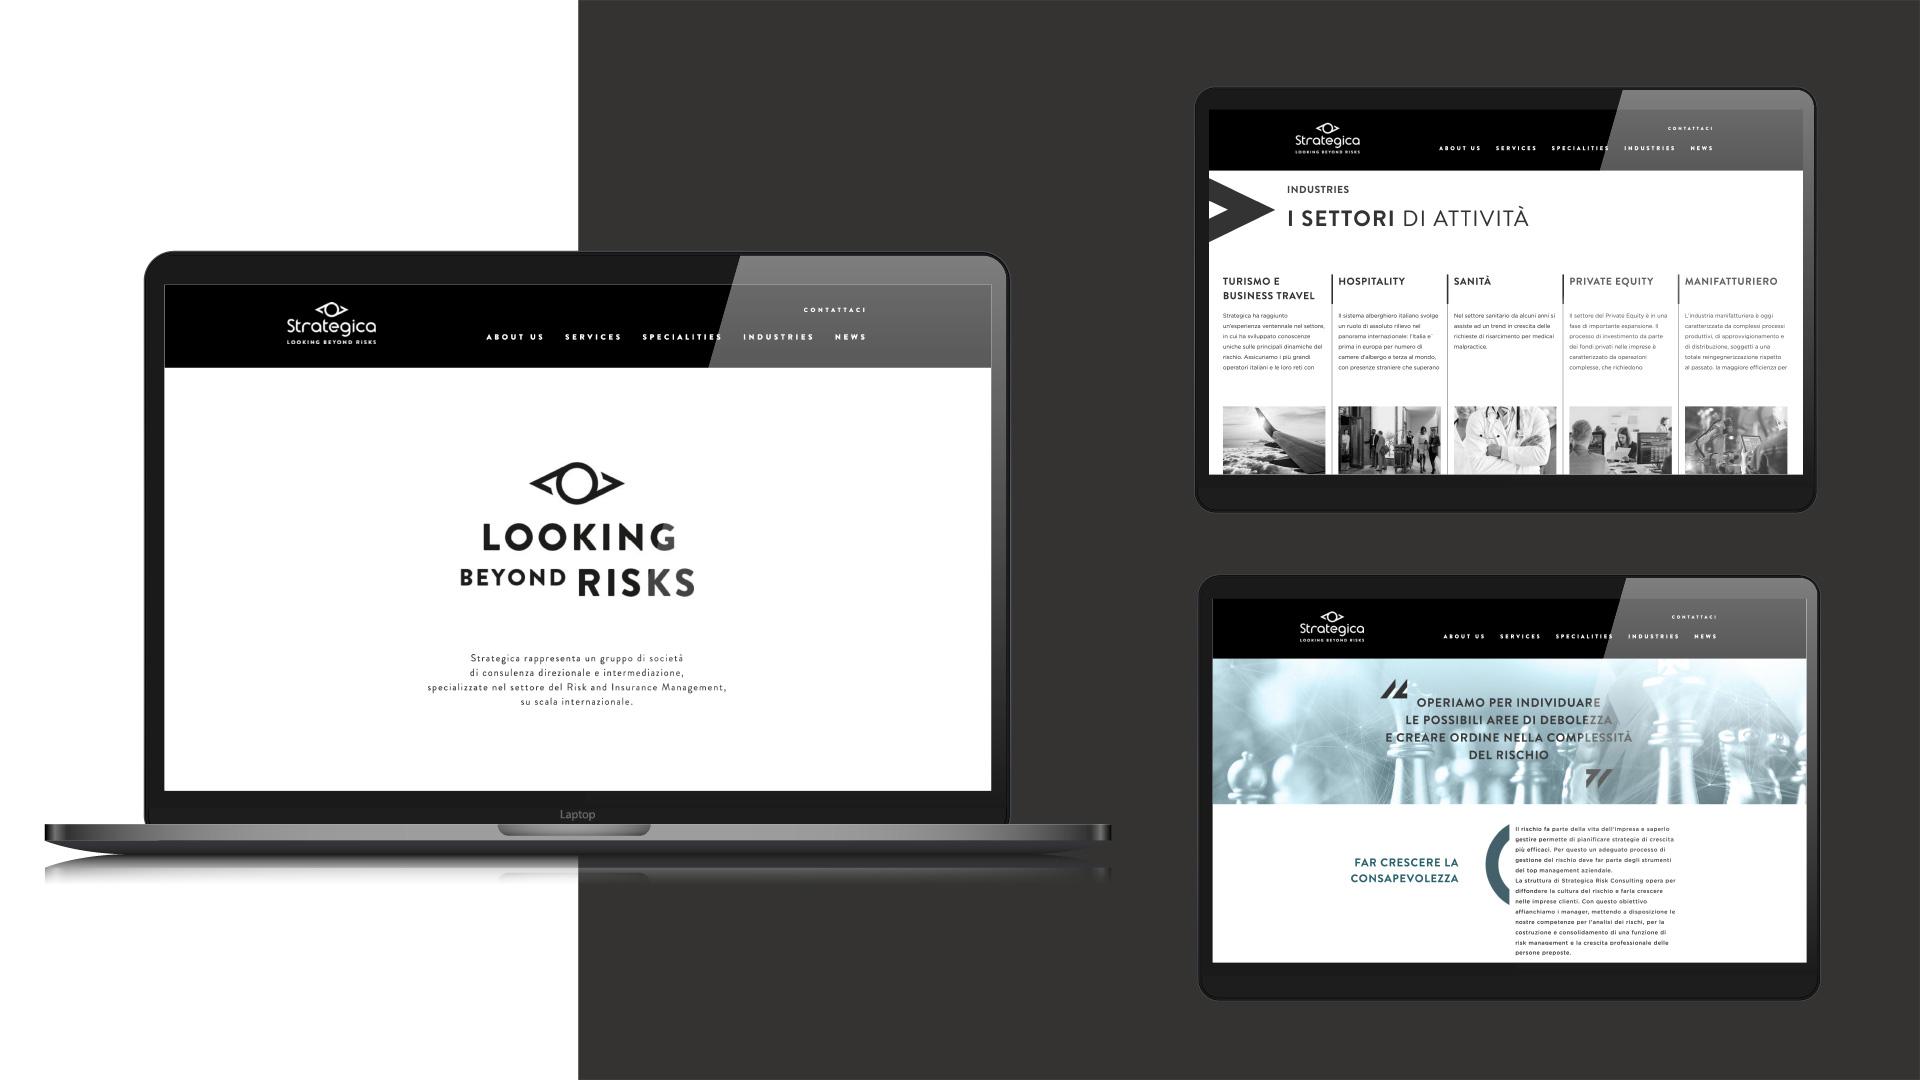 Strategica-Rba-Design-007